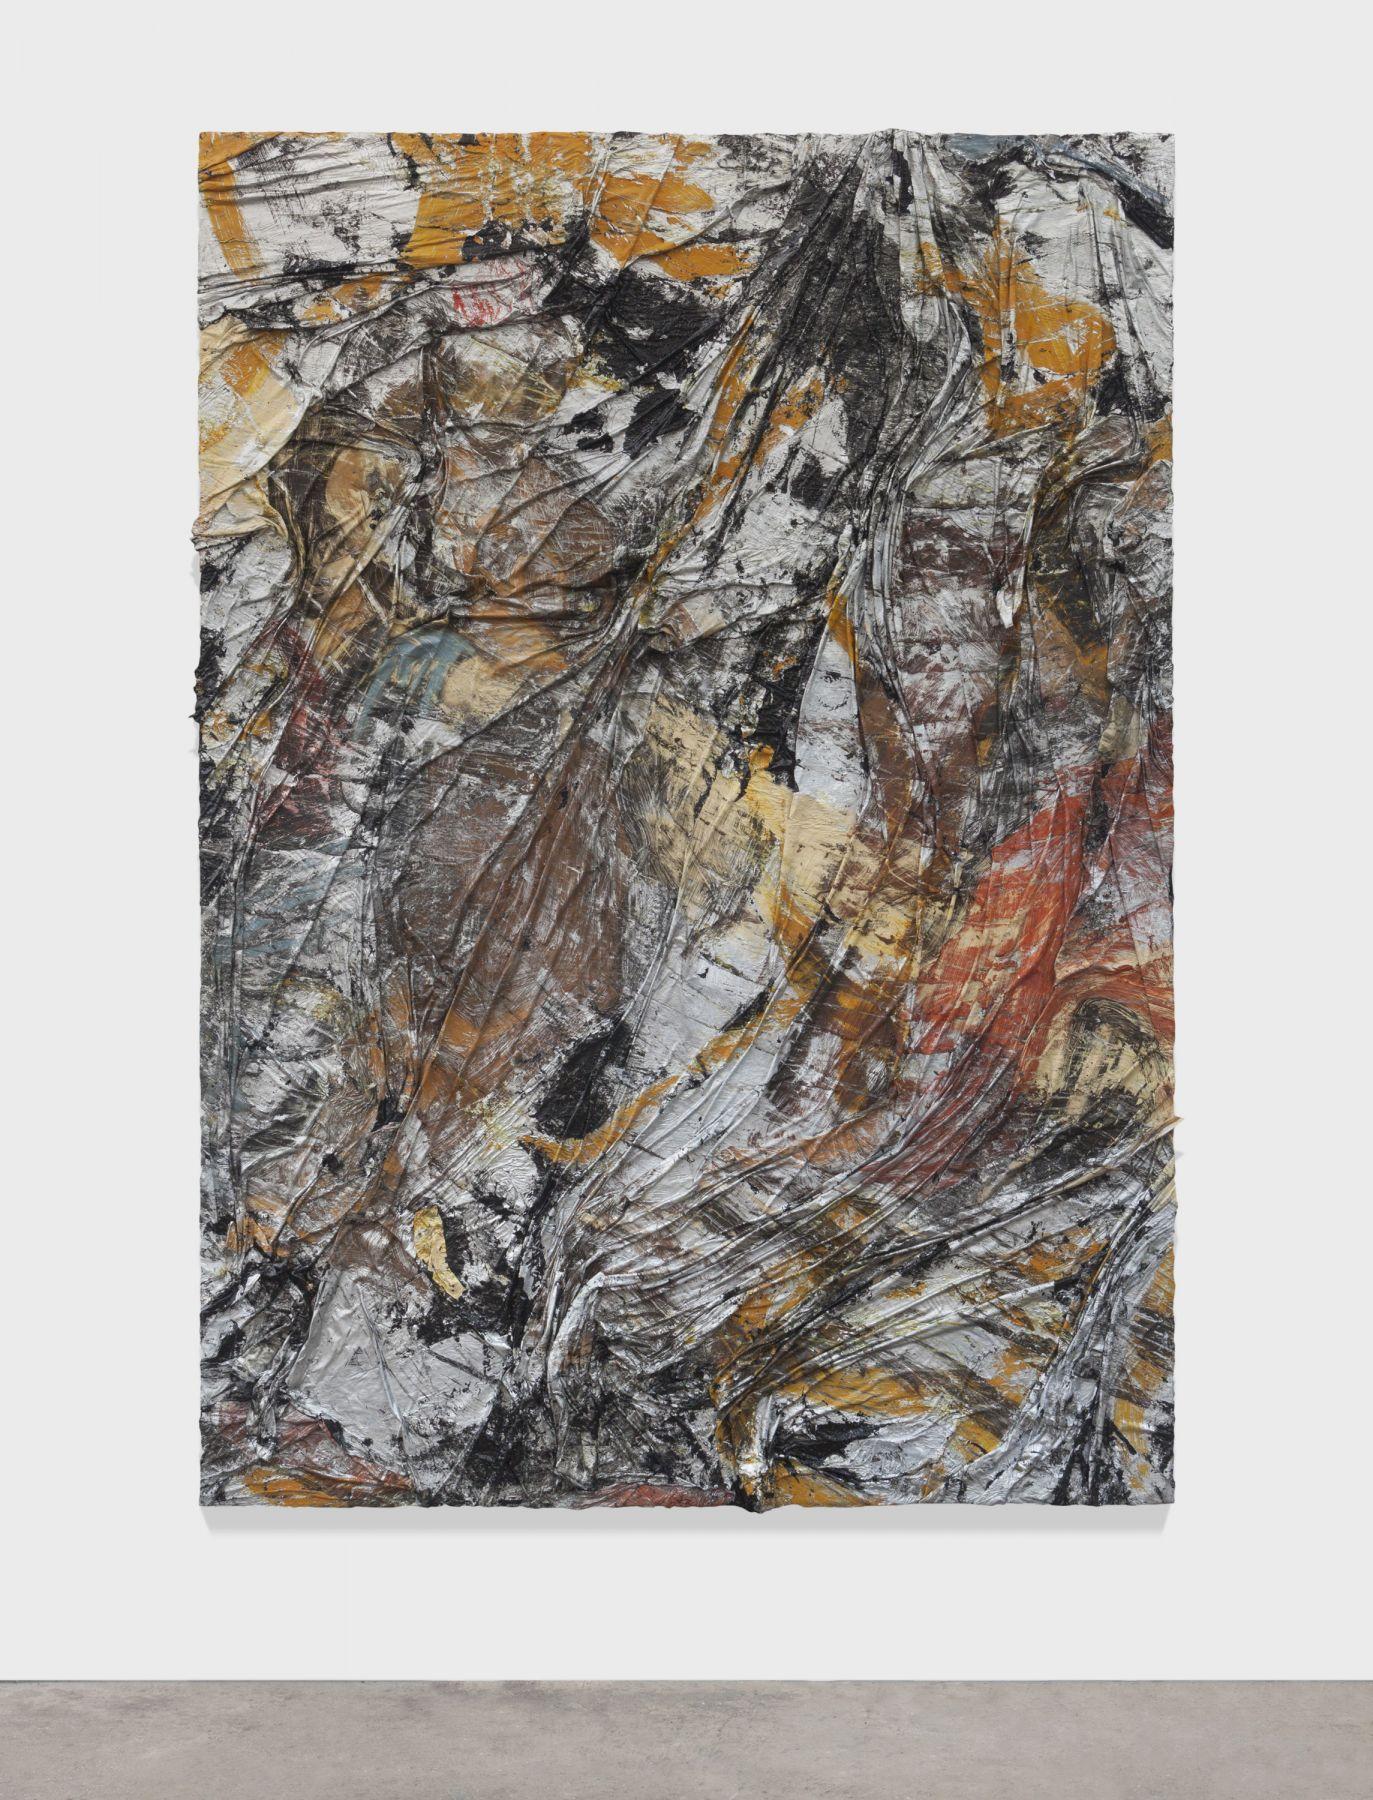 ANGEL OTERO, Untitled, 2013